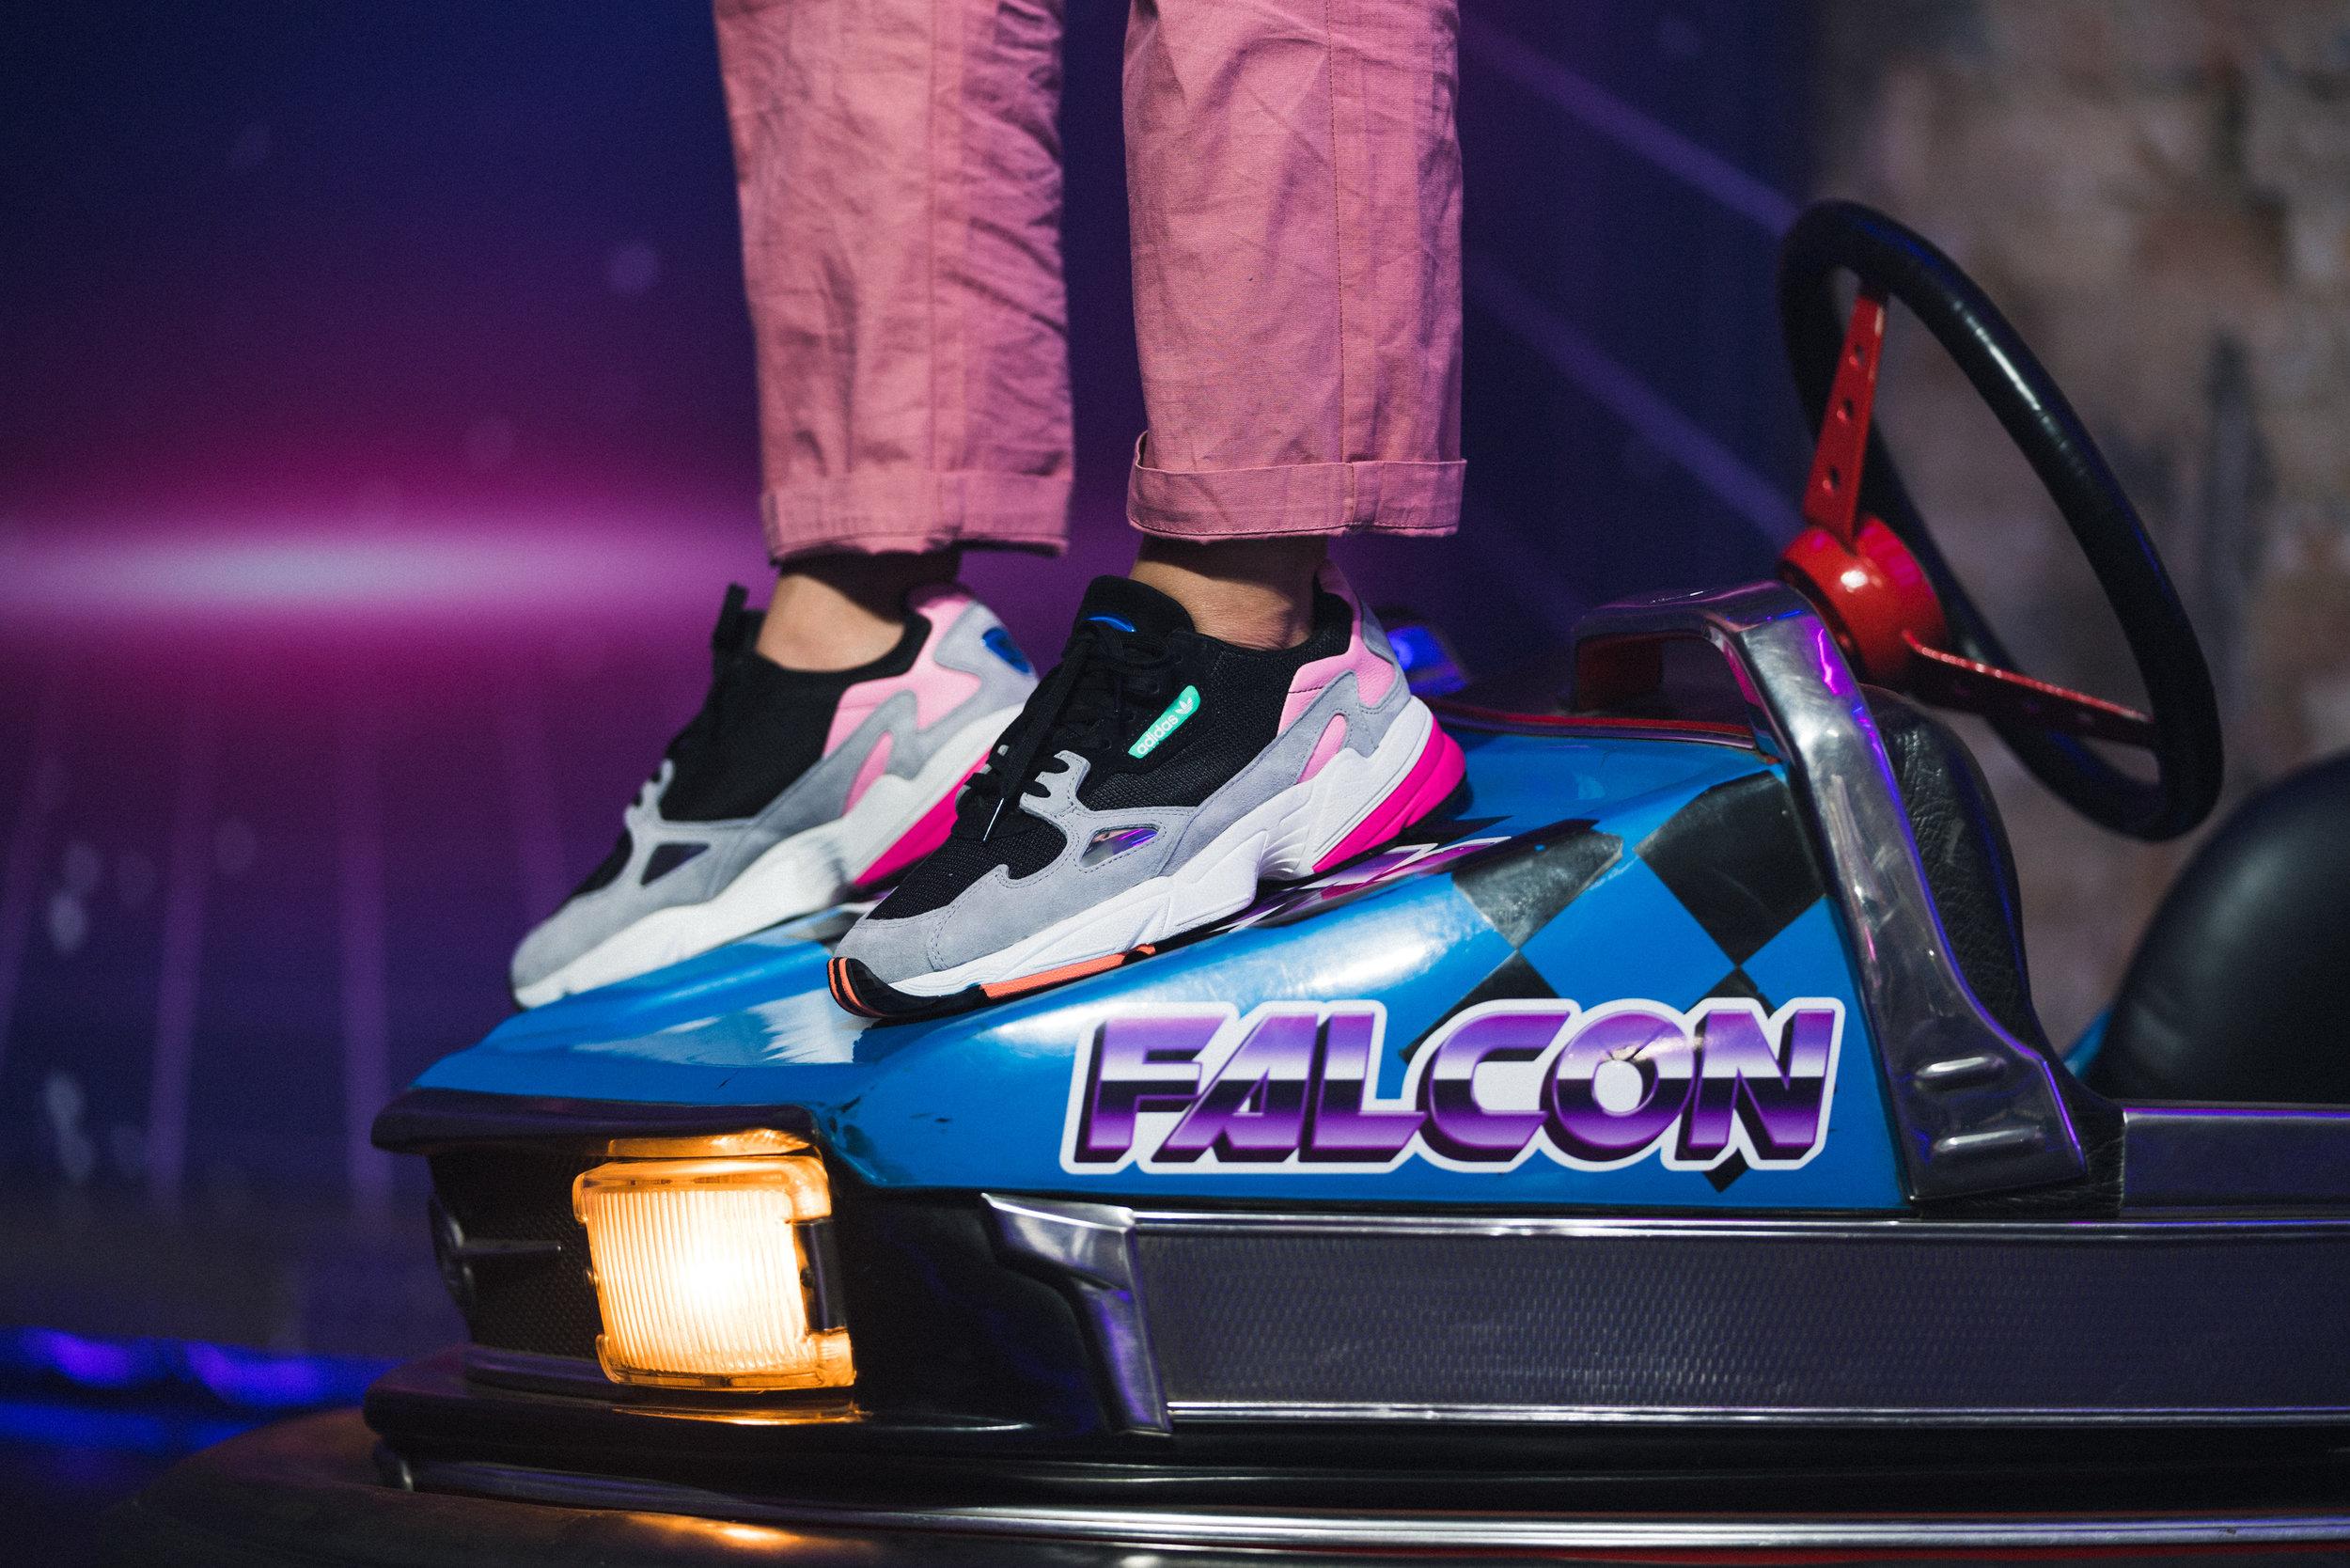 adidas_falcon_event_berlin_kickiyangz_by_kane_for_sneakersmag-9.jpg